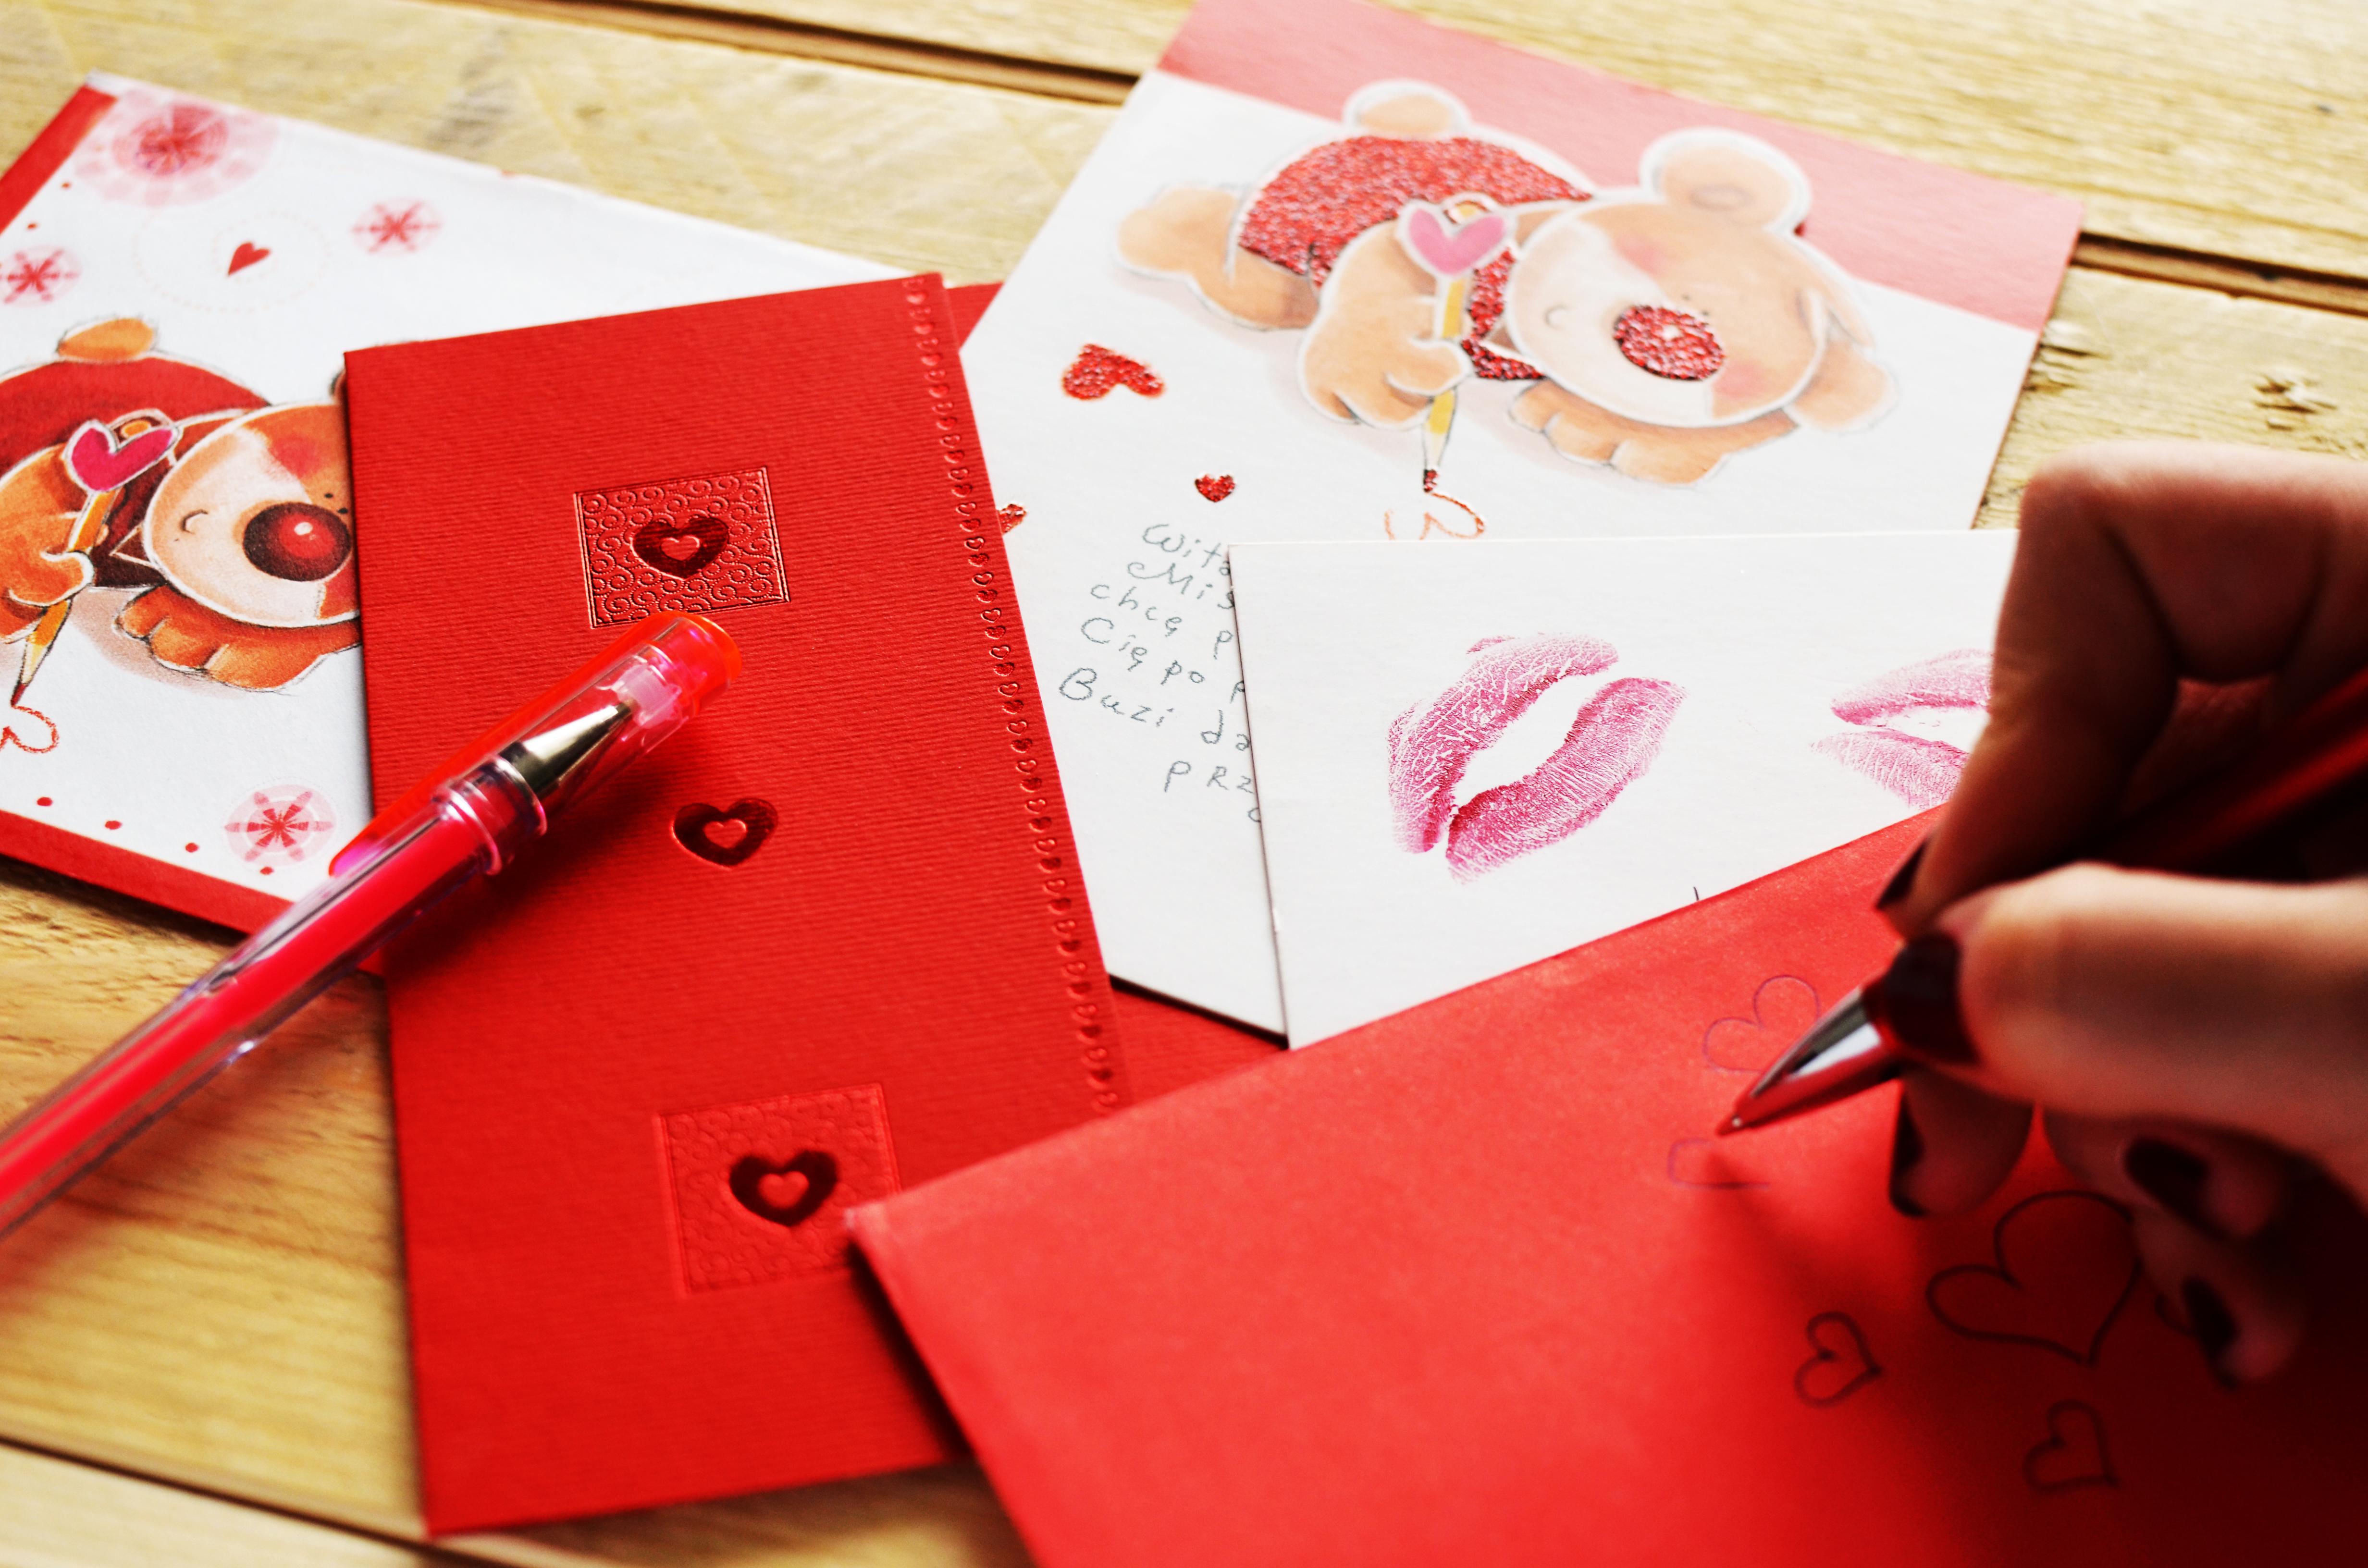 5 original ways to design your own christmas card - Design Your Own Christmas Cards